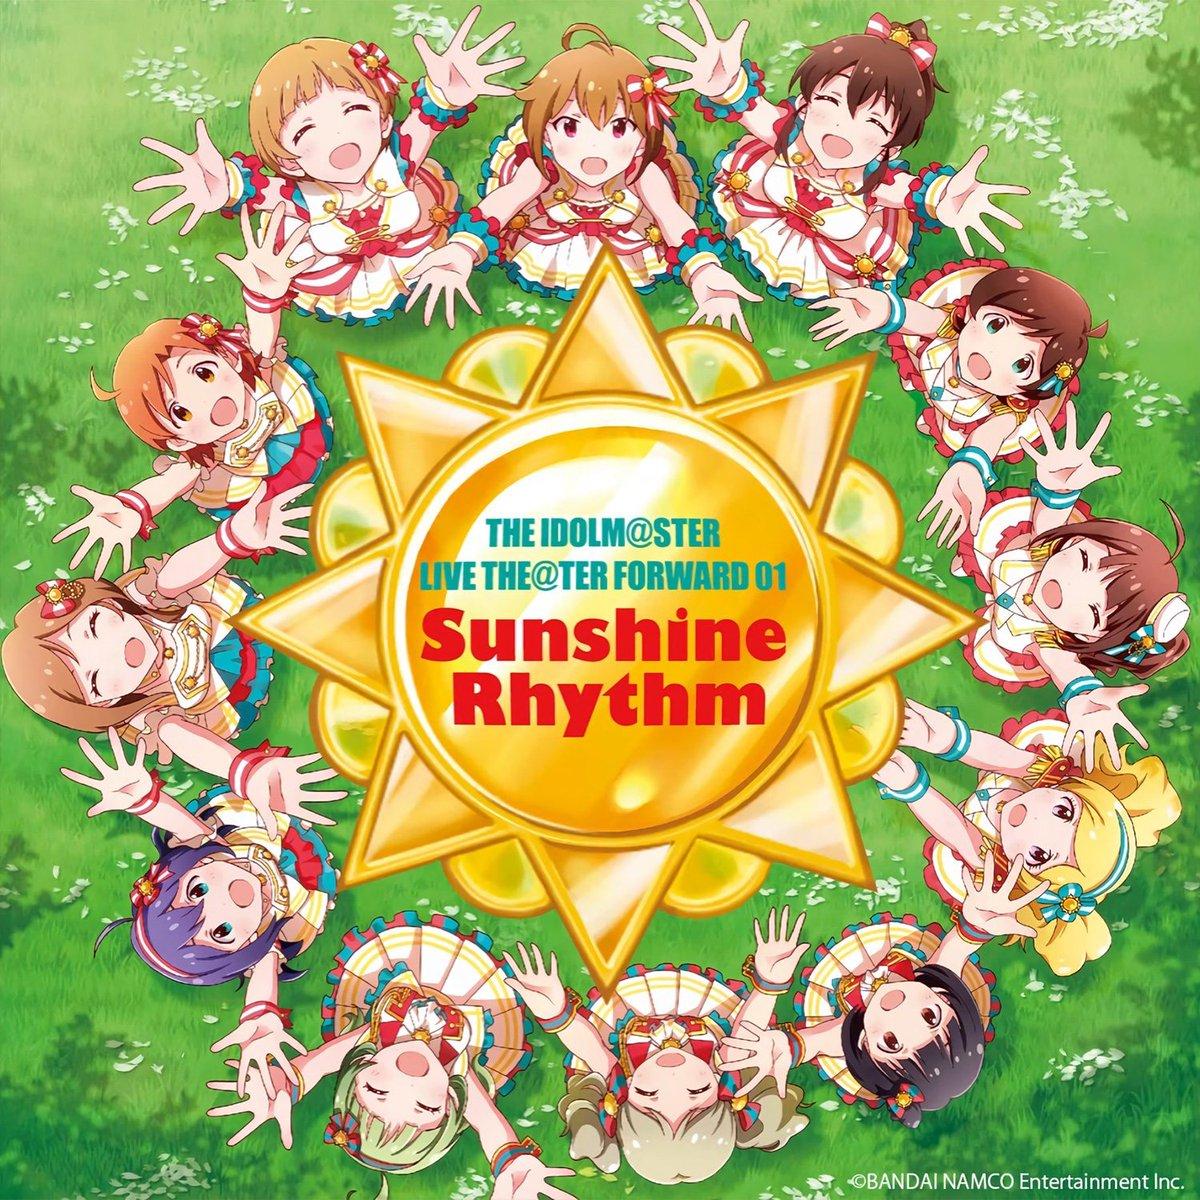 test ツイッターメディア - #Nowplaying サンリズム・オーケストラ♪ - Sunshine Rhythm (Machico, 郁原ゆう, 田村奈央, 大関英里, 角元明日香, 原嶋あかり, 浜崎奈々, 夏川椎菜, 山口立花子, 木戸衣吹, 渡部優衣, 中村温姫) (THE IDOLM@STER LIVE THE@TER FORWARD 01 Sunshine Rhythm) https://t.co/9GyThQrpsM